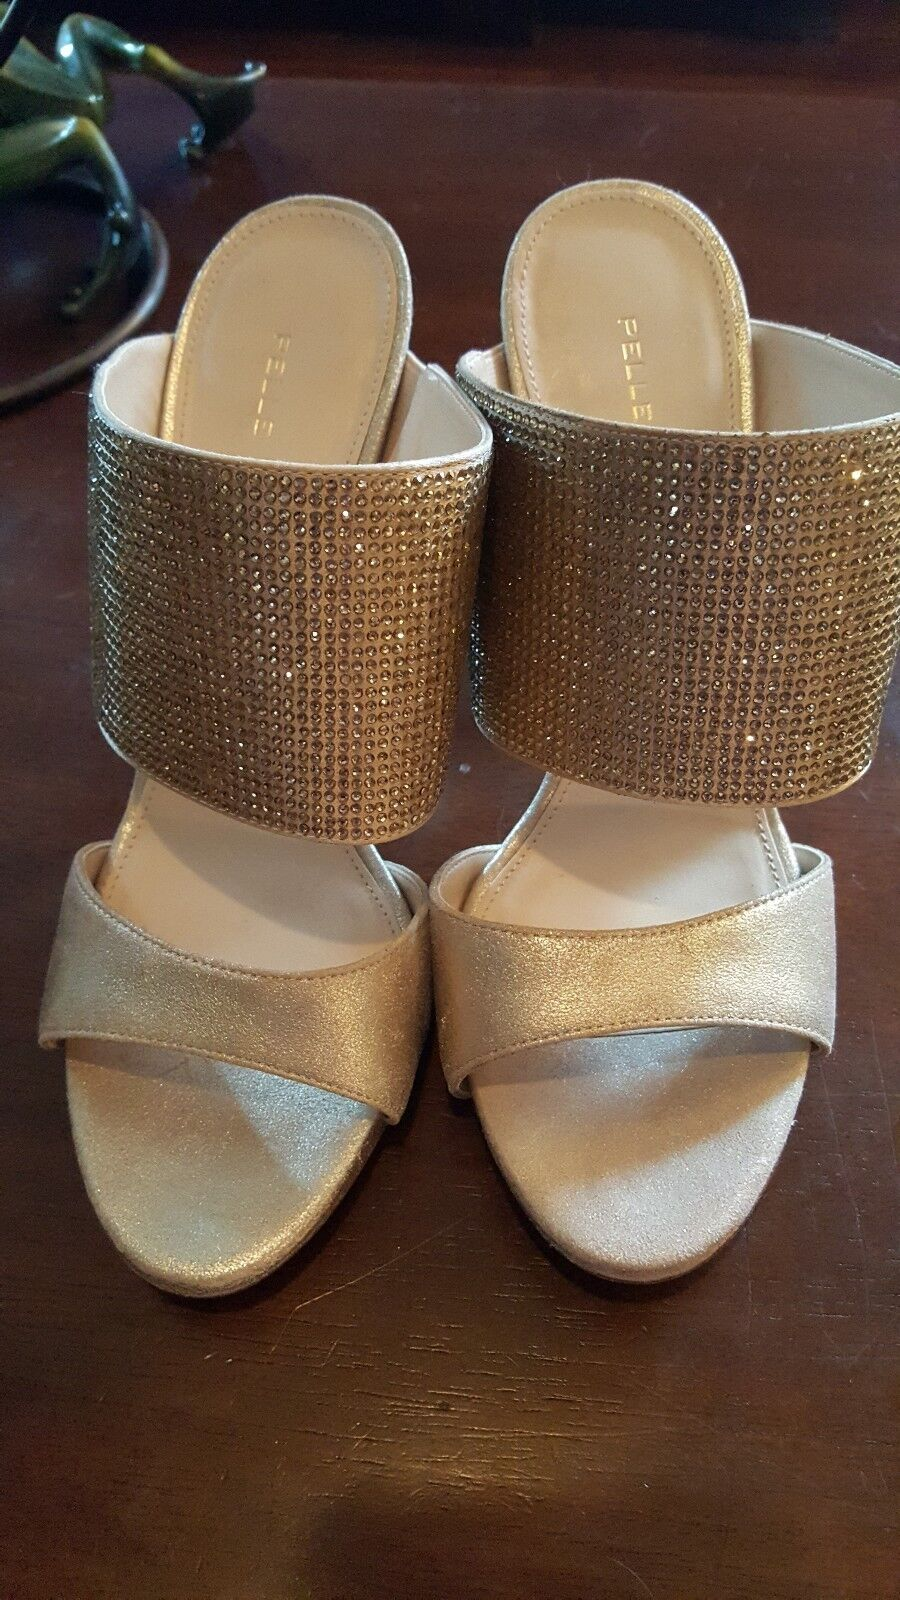 Pelle Moda gold Glitter Stilettos Womens Heels Size 8.5 NEW